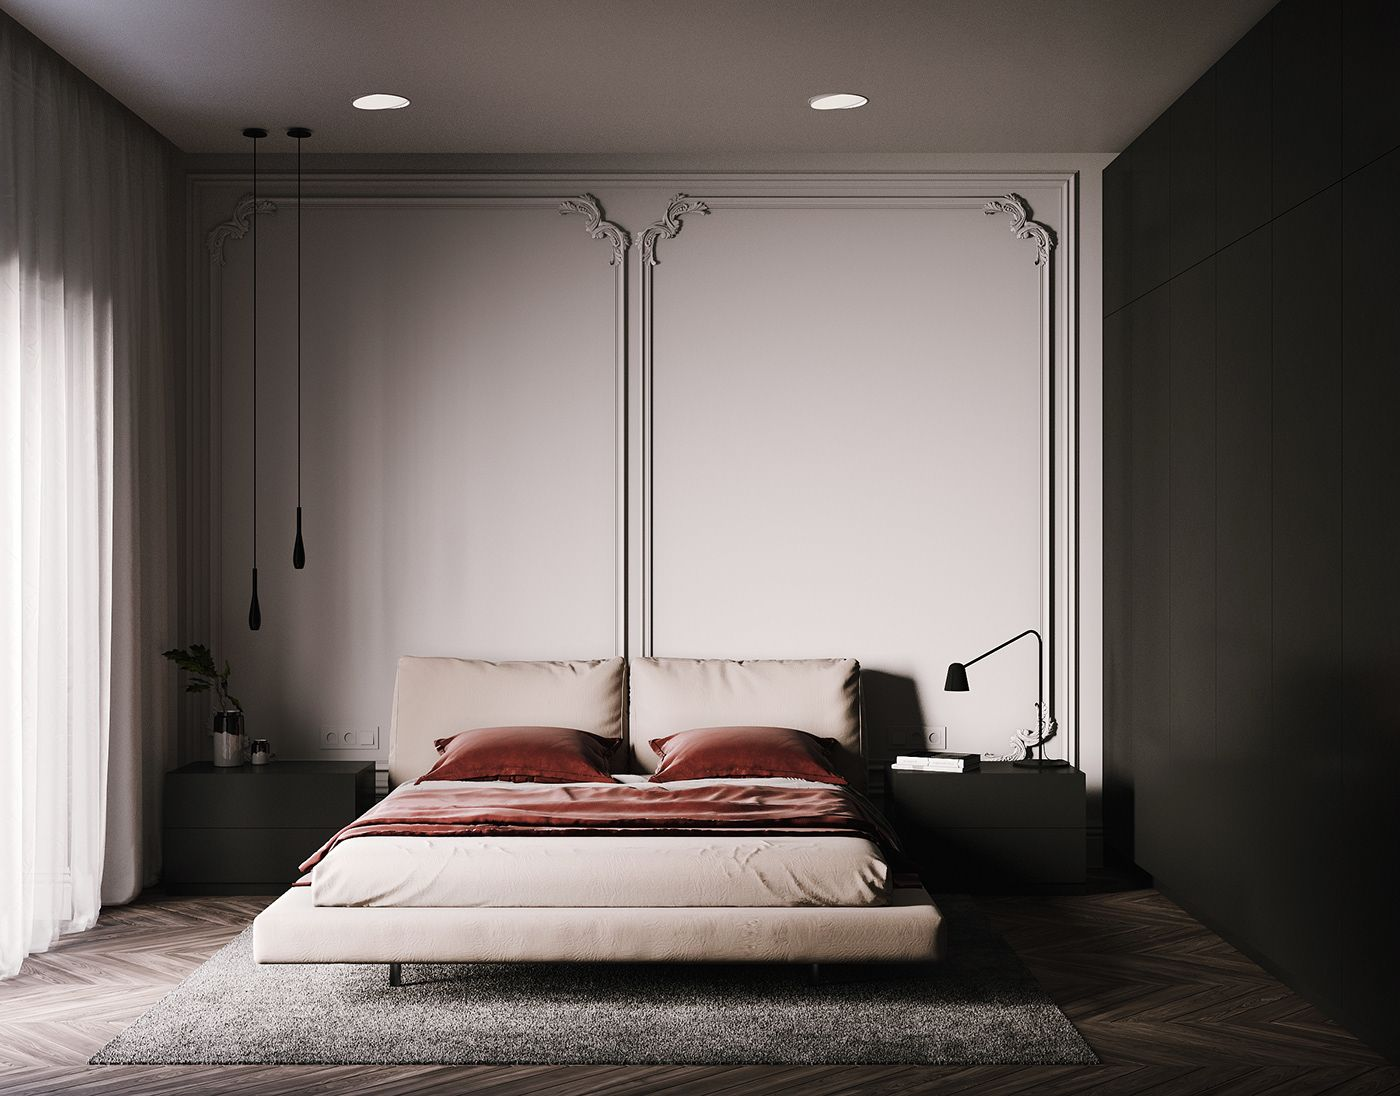 Bedroom Design On Behance Bedroom Design Interior Design